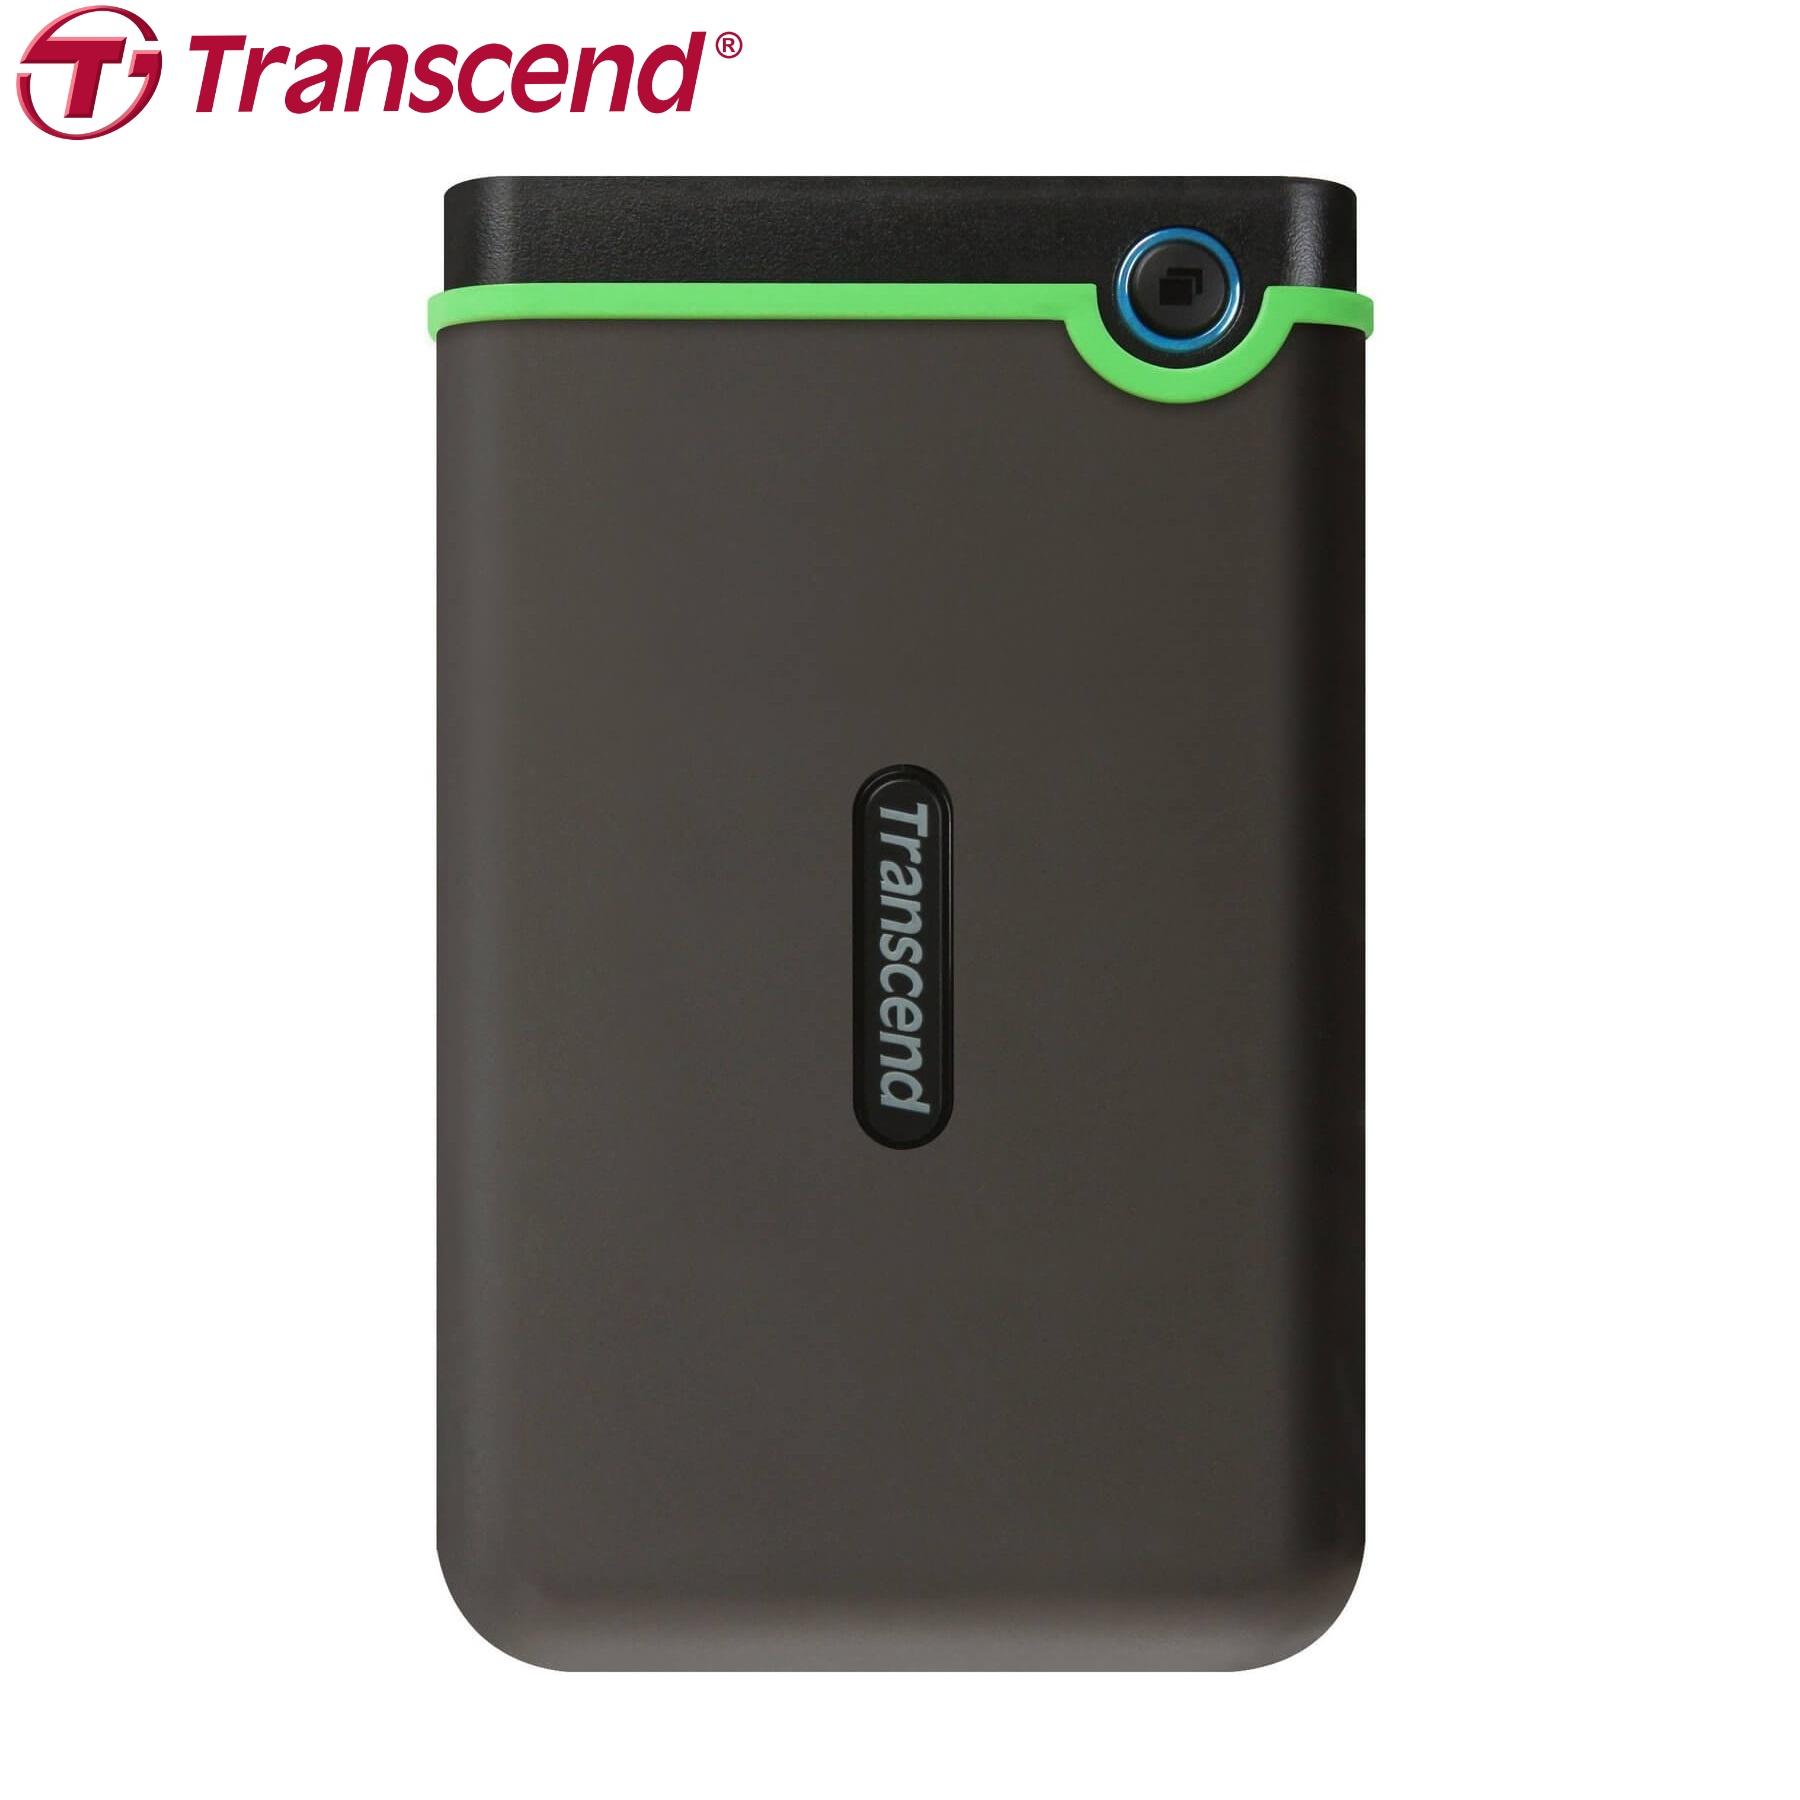 Transcend 2TB StoreJet 25M3S USB 3.1 External Hard Drive Shock Proof Military Drop Tested